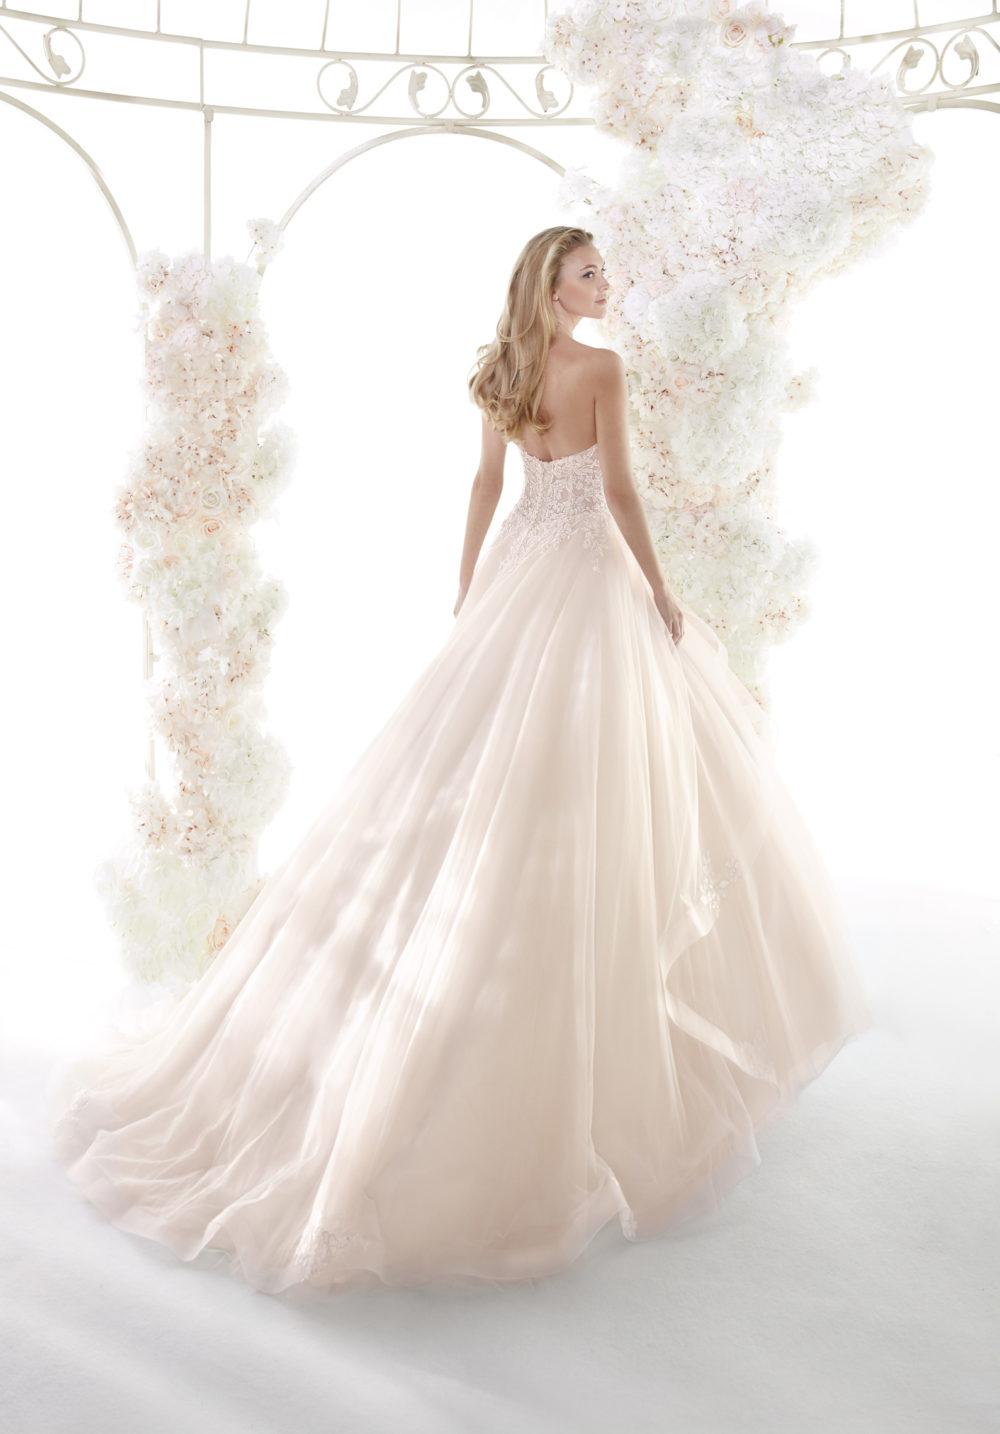 Mariages: abito da sposa Colet 2020 a Vicenza, Verona, Padova, Veneto COA20161